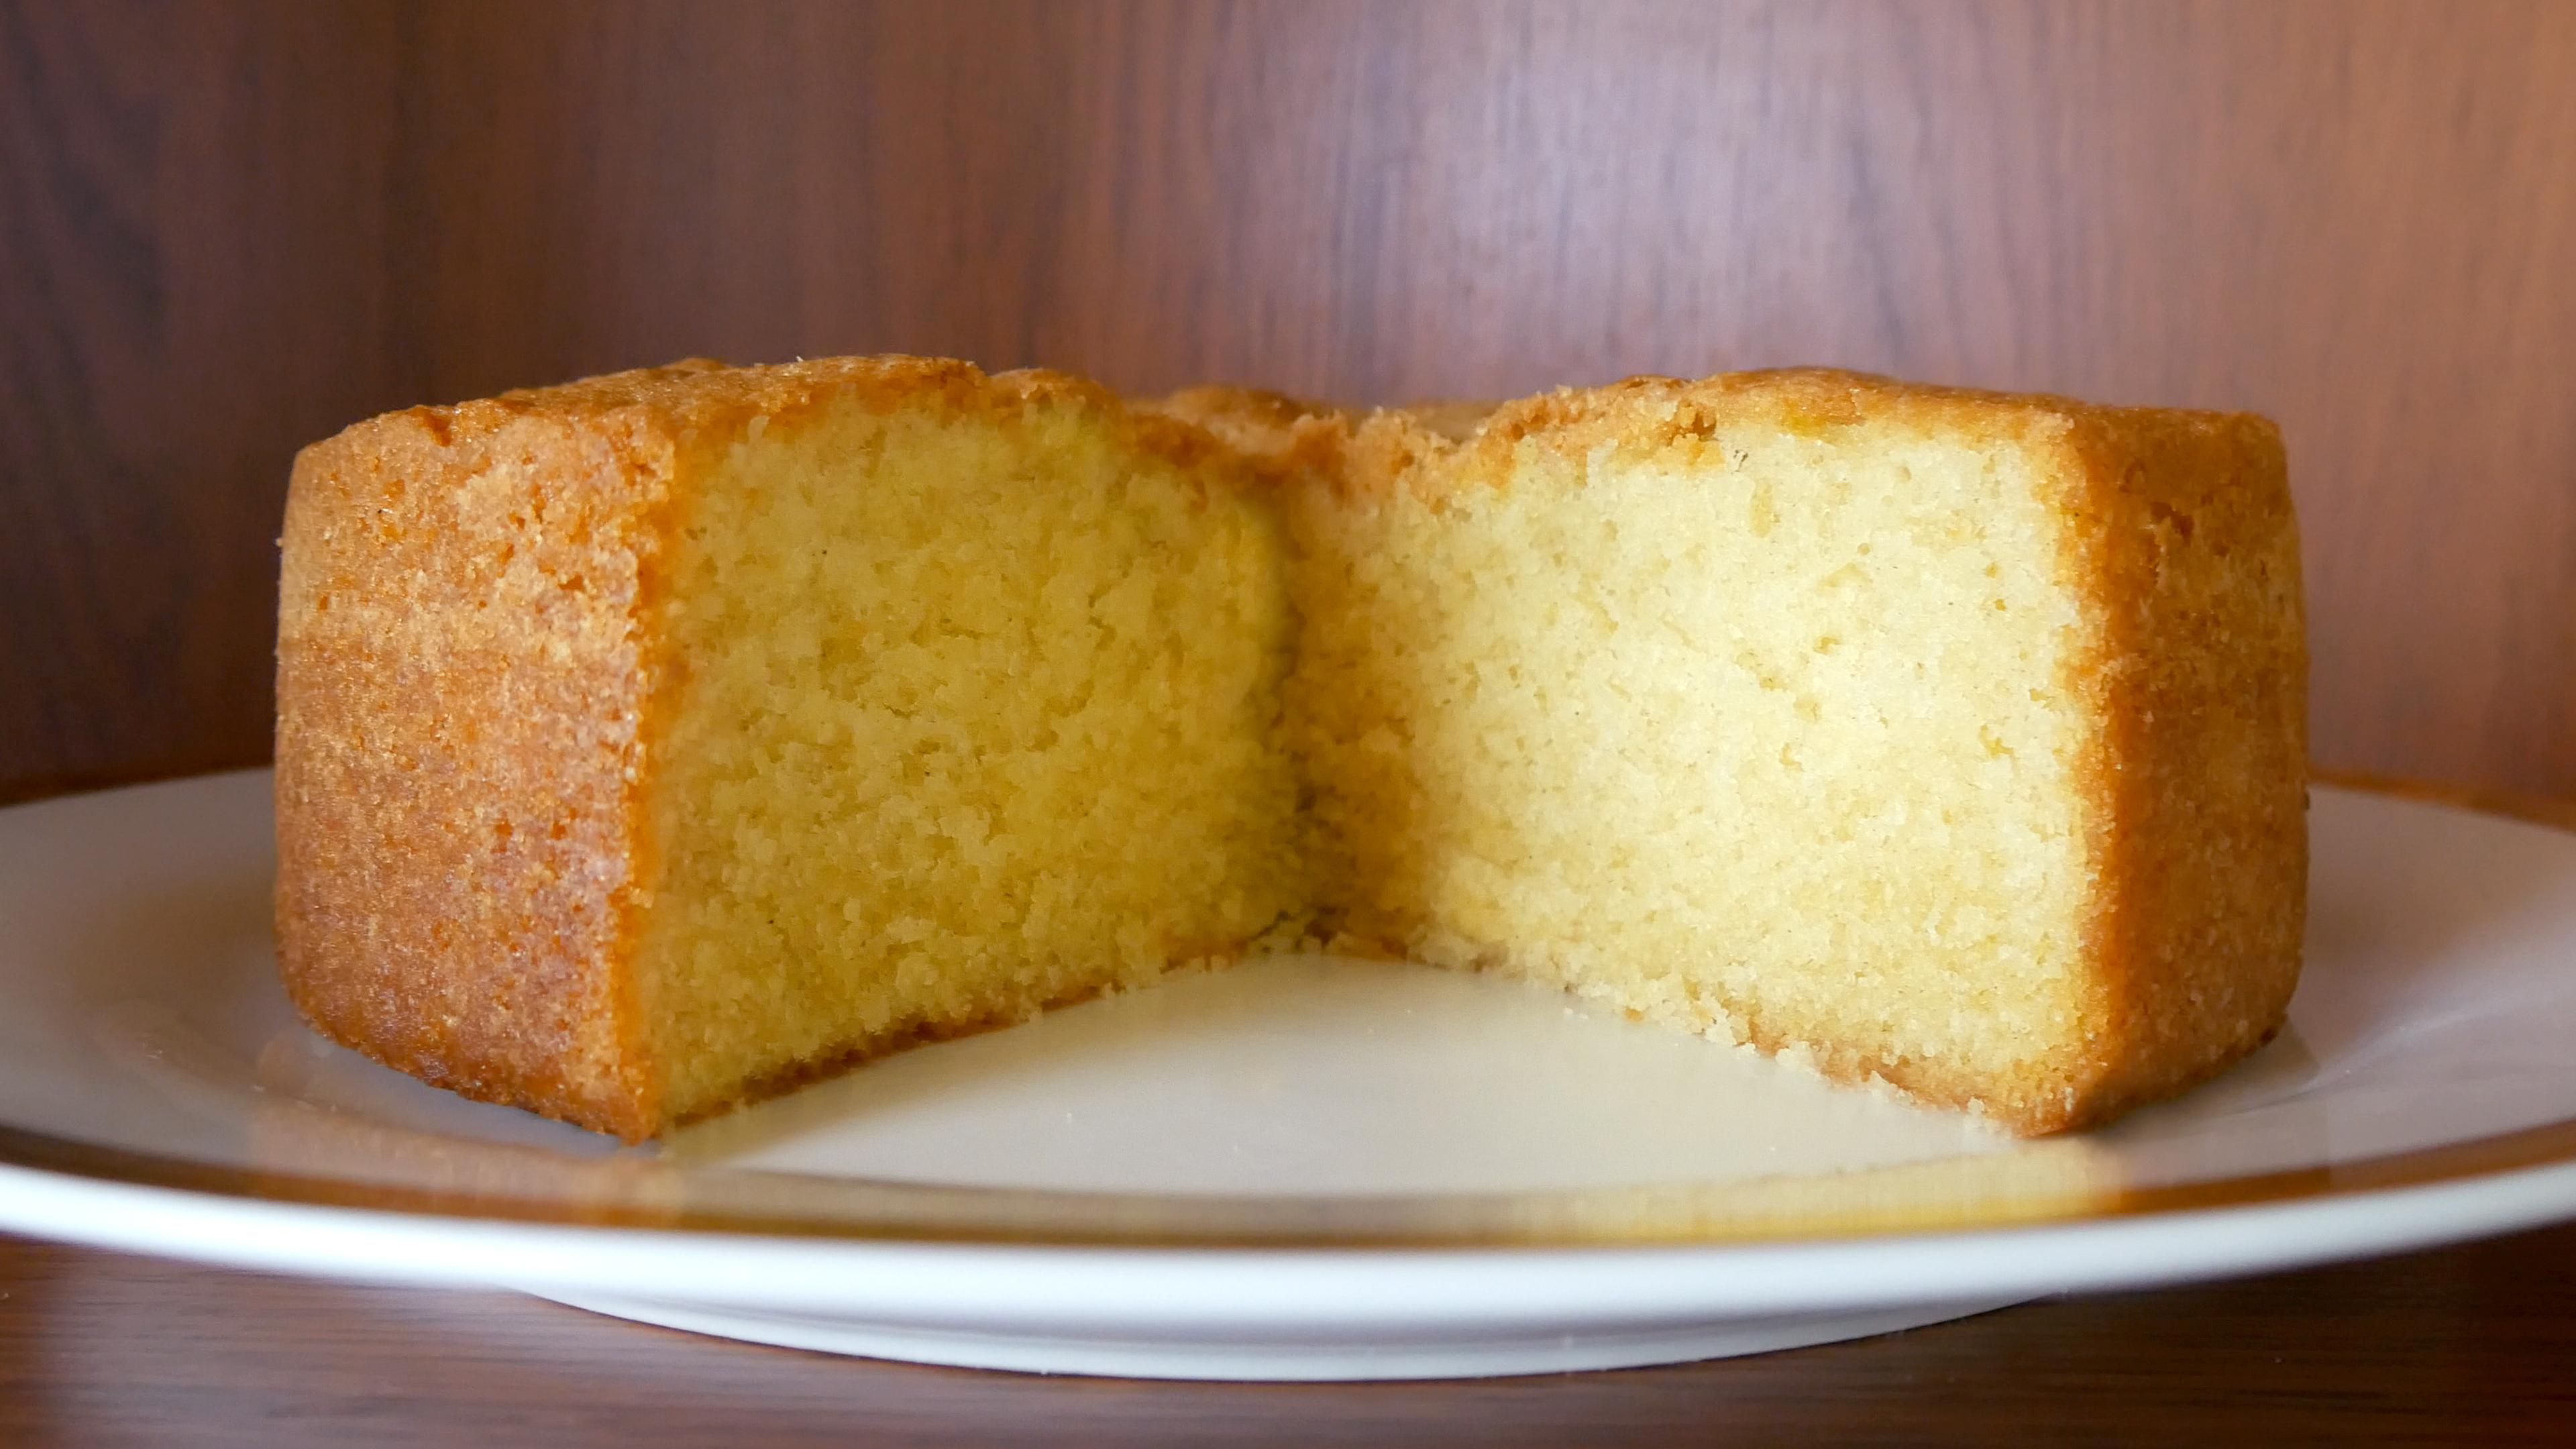 Picture of SIMPLE VANILLA SPONGE (POUND) CAKE